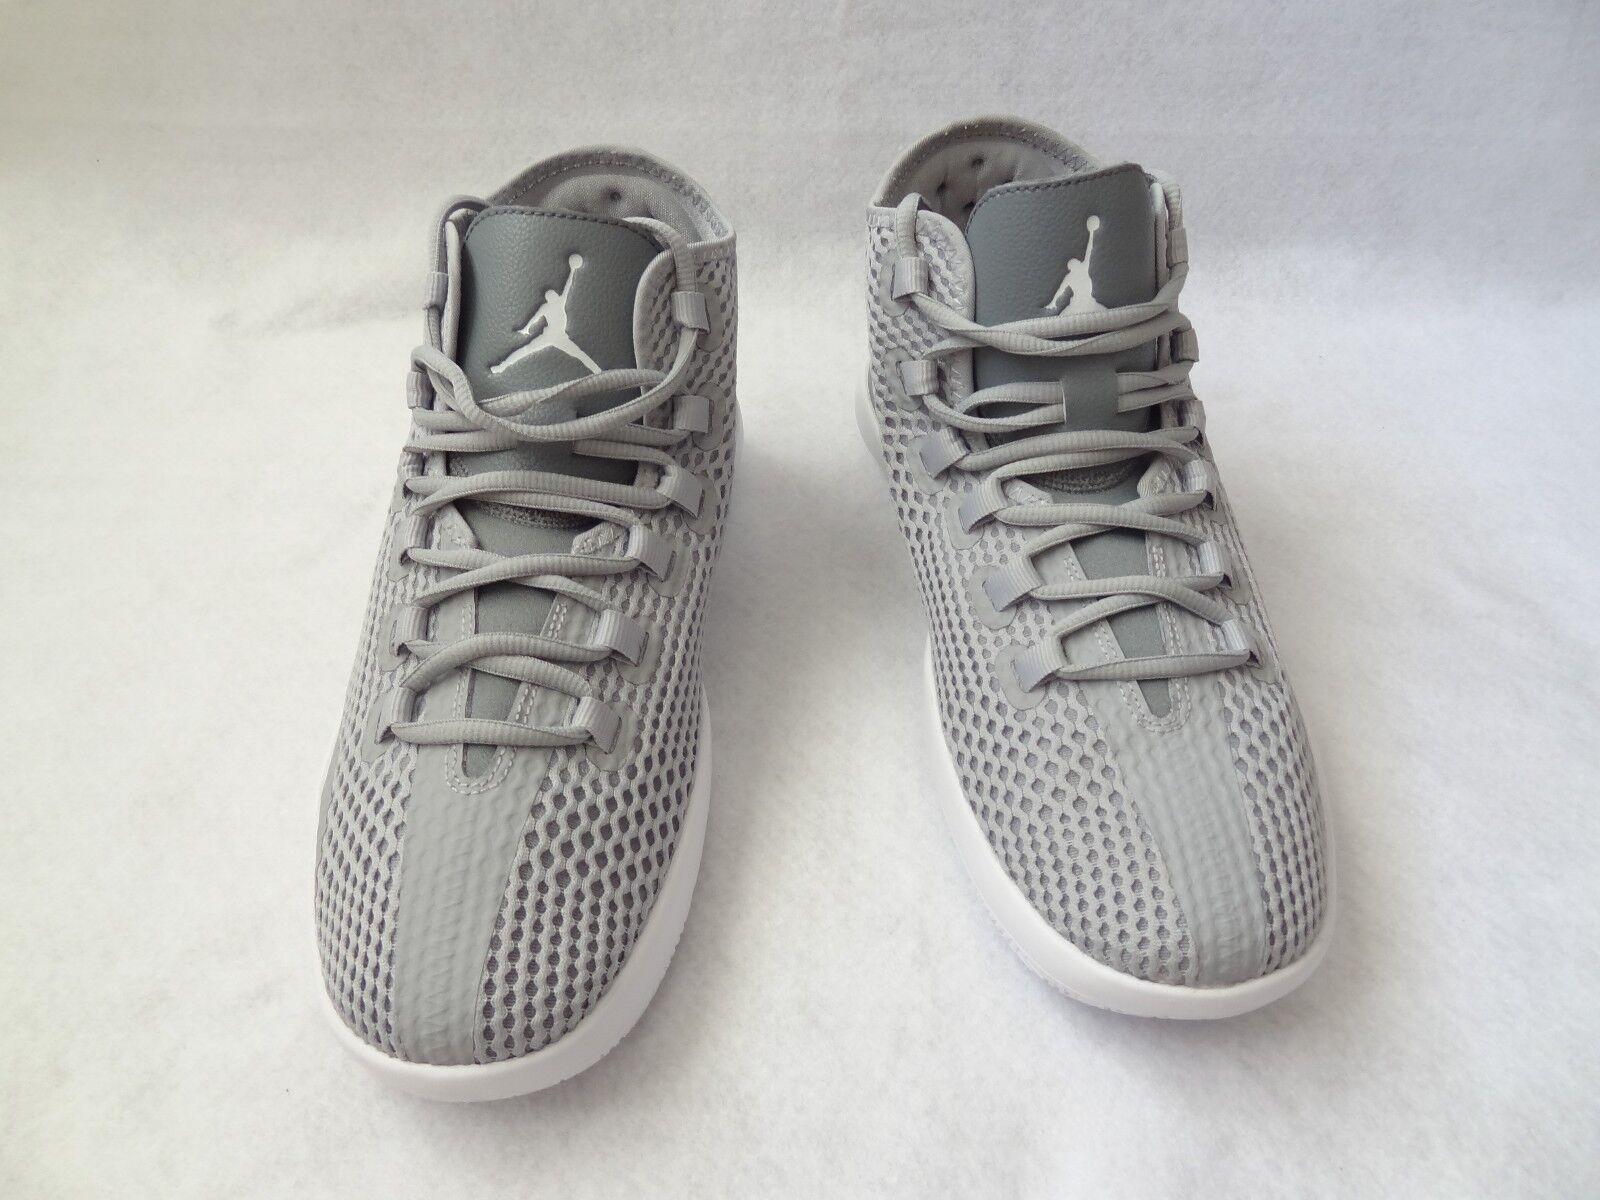 Jordan Reveal Mens Basketball Shoes 9.5 Wolf Grey/White Cool Grey Infrared